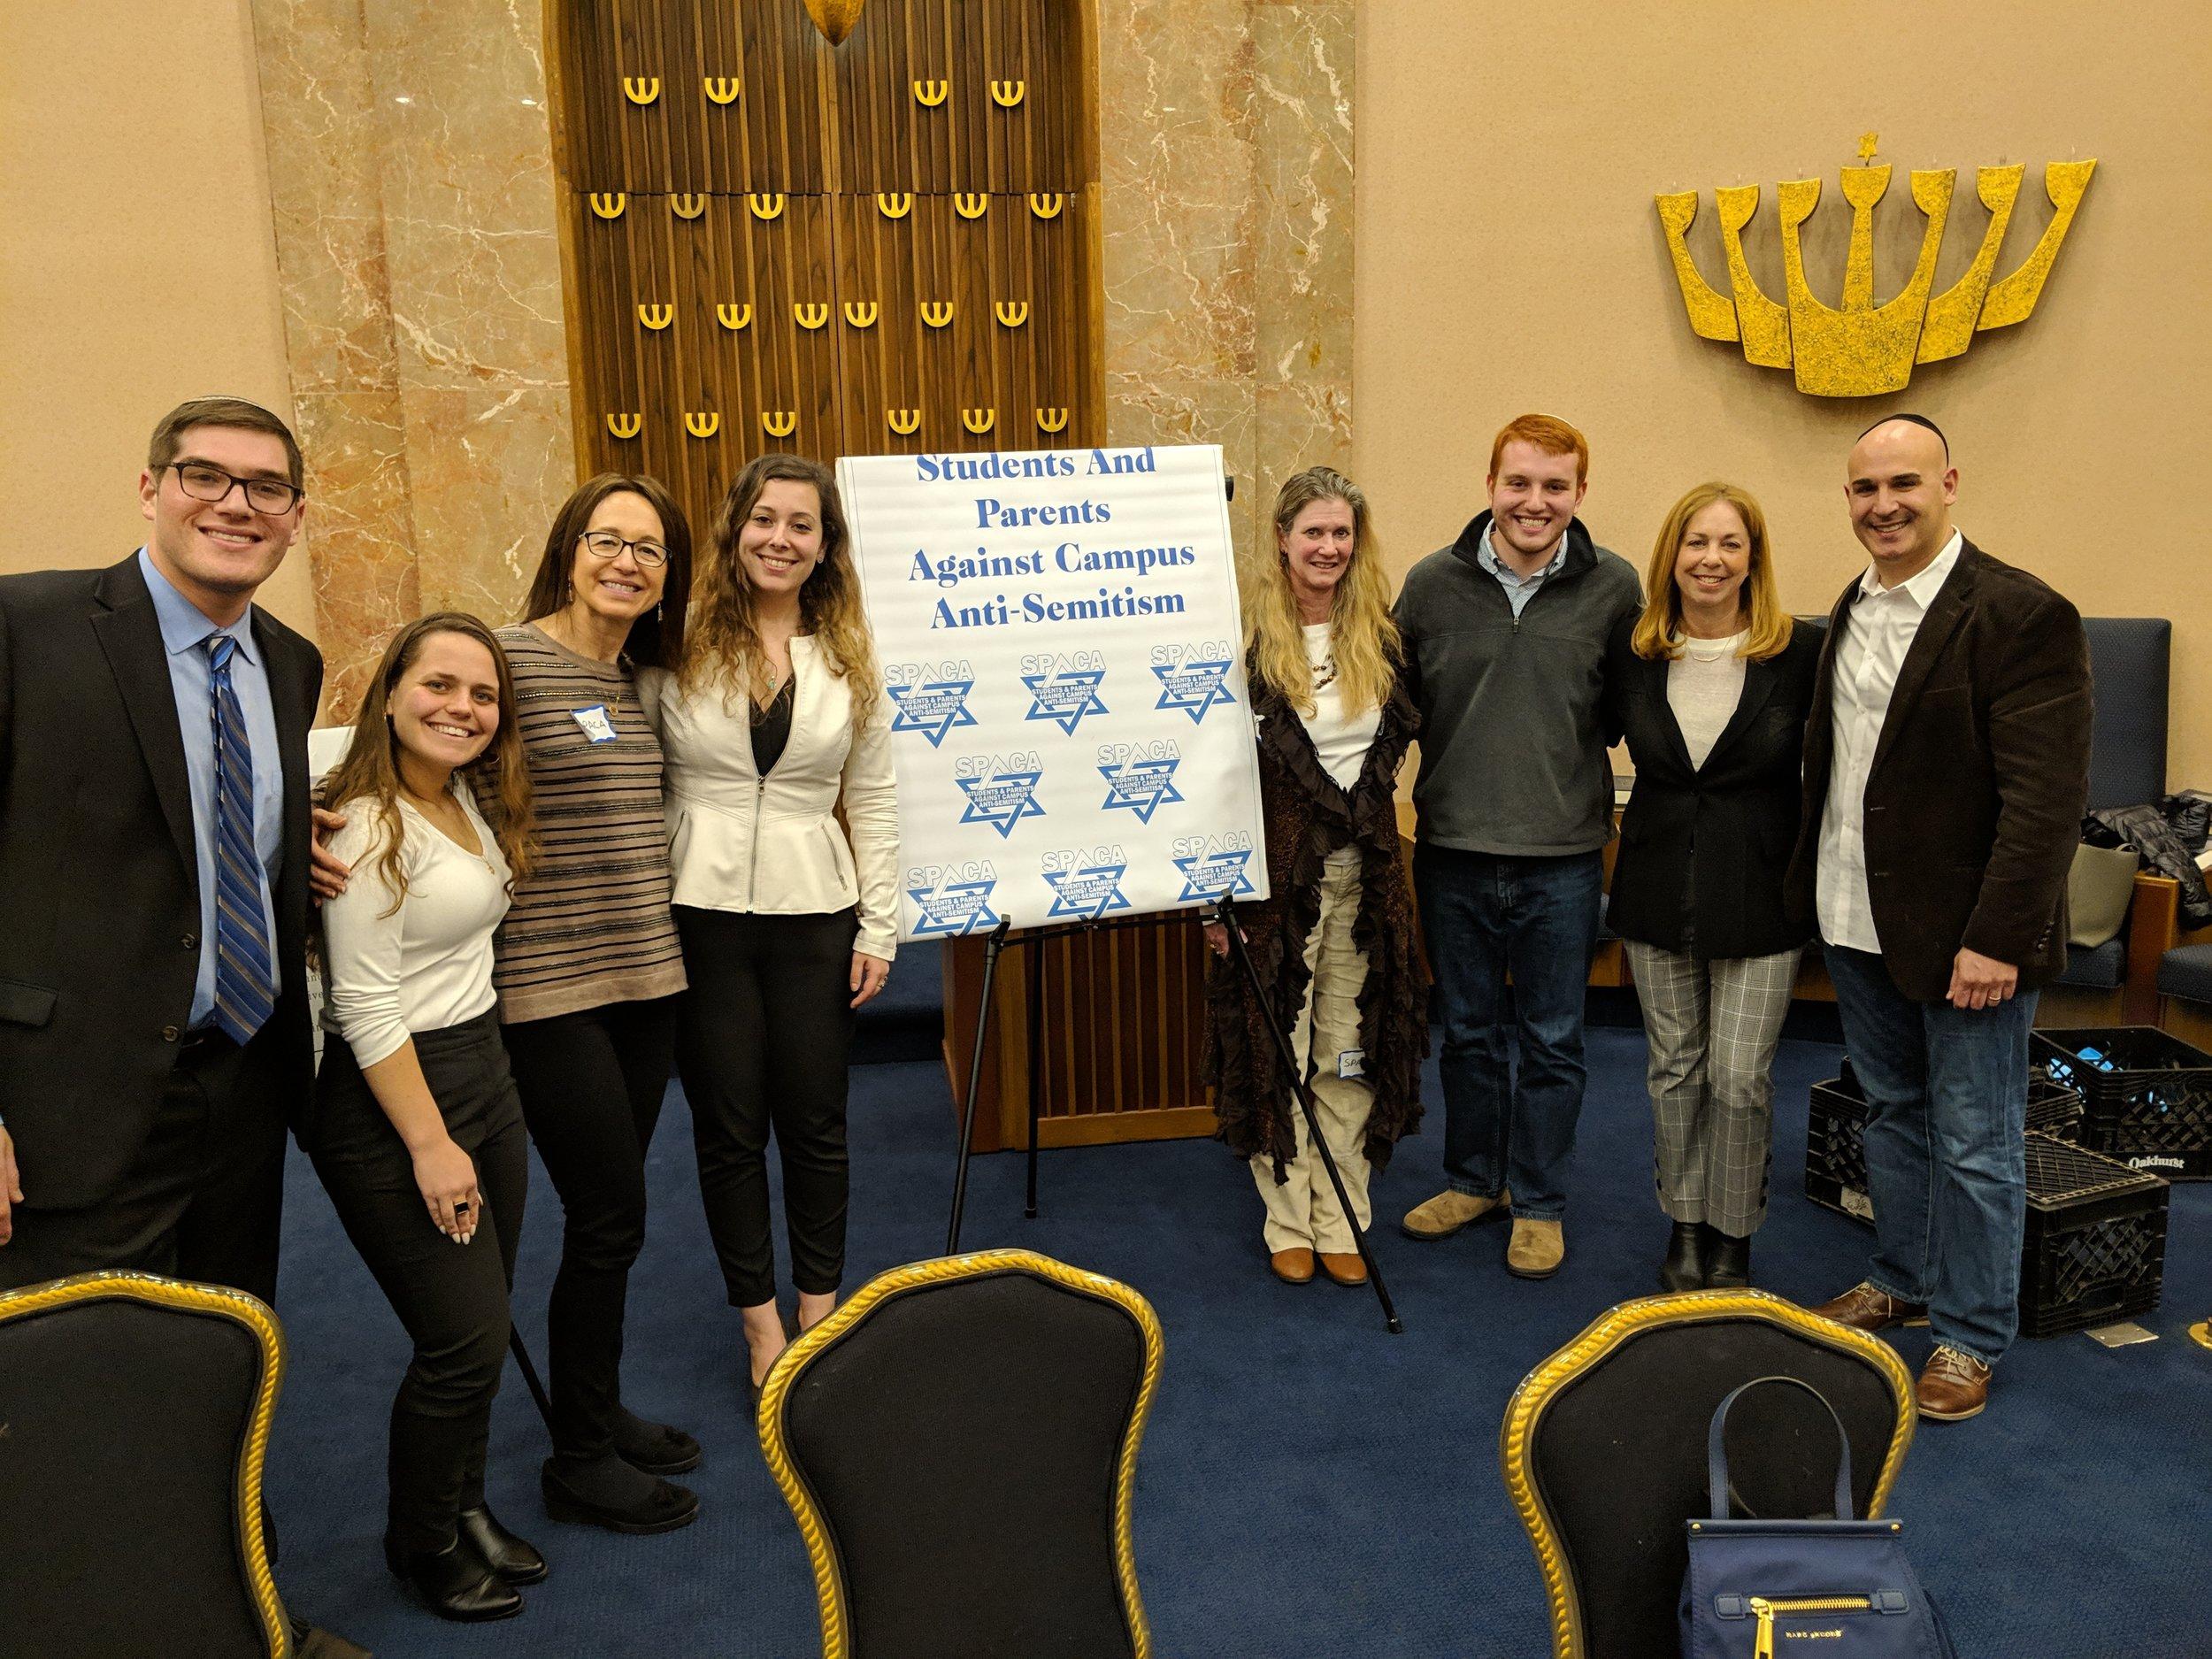 From left to right: Rabbi Jack Dermer, Ofir Dayan, Shoshana Bederman, Dalia Zahger, Tamar Ben-Simon, Joshua Yoni Nirenberg, Sharon Freudenstein, Ammer Benno